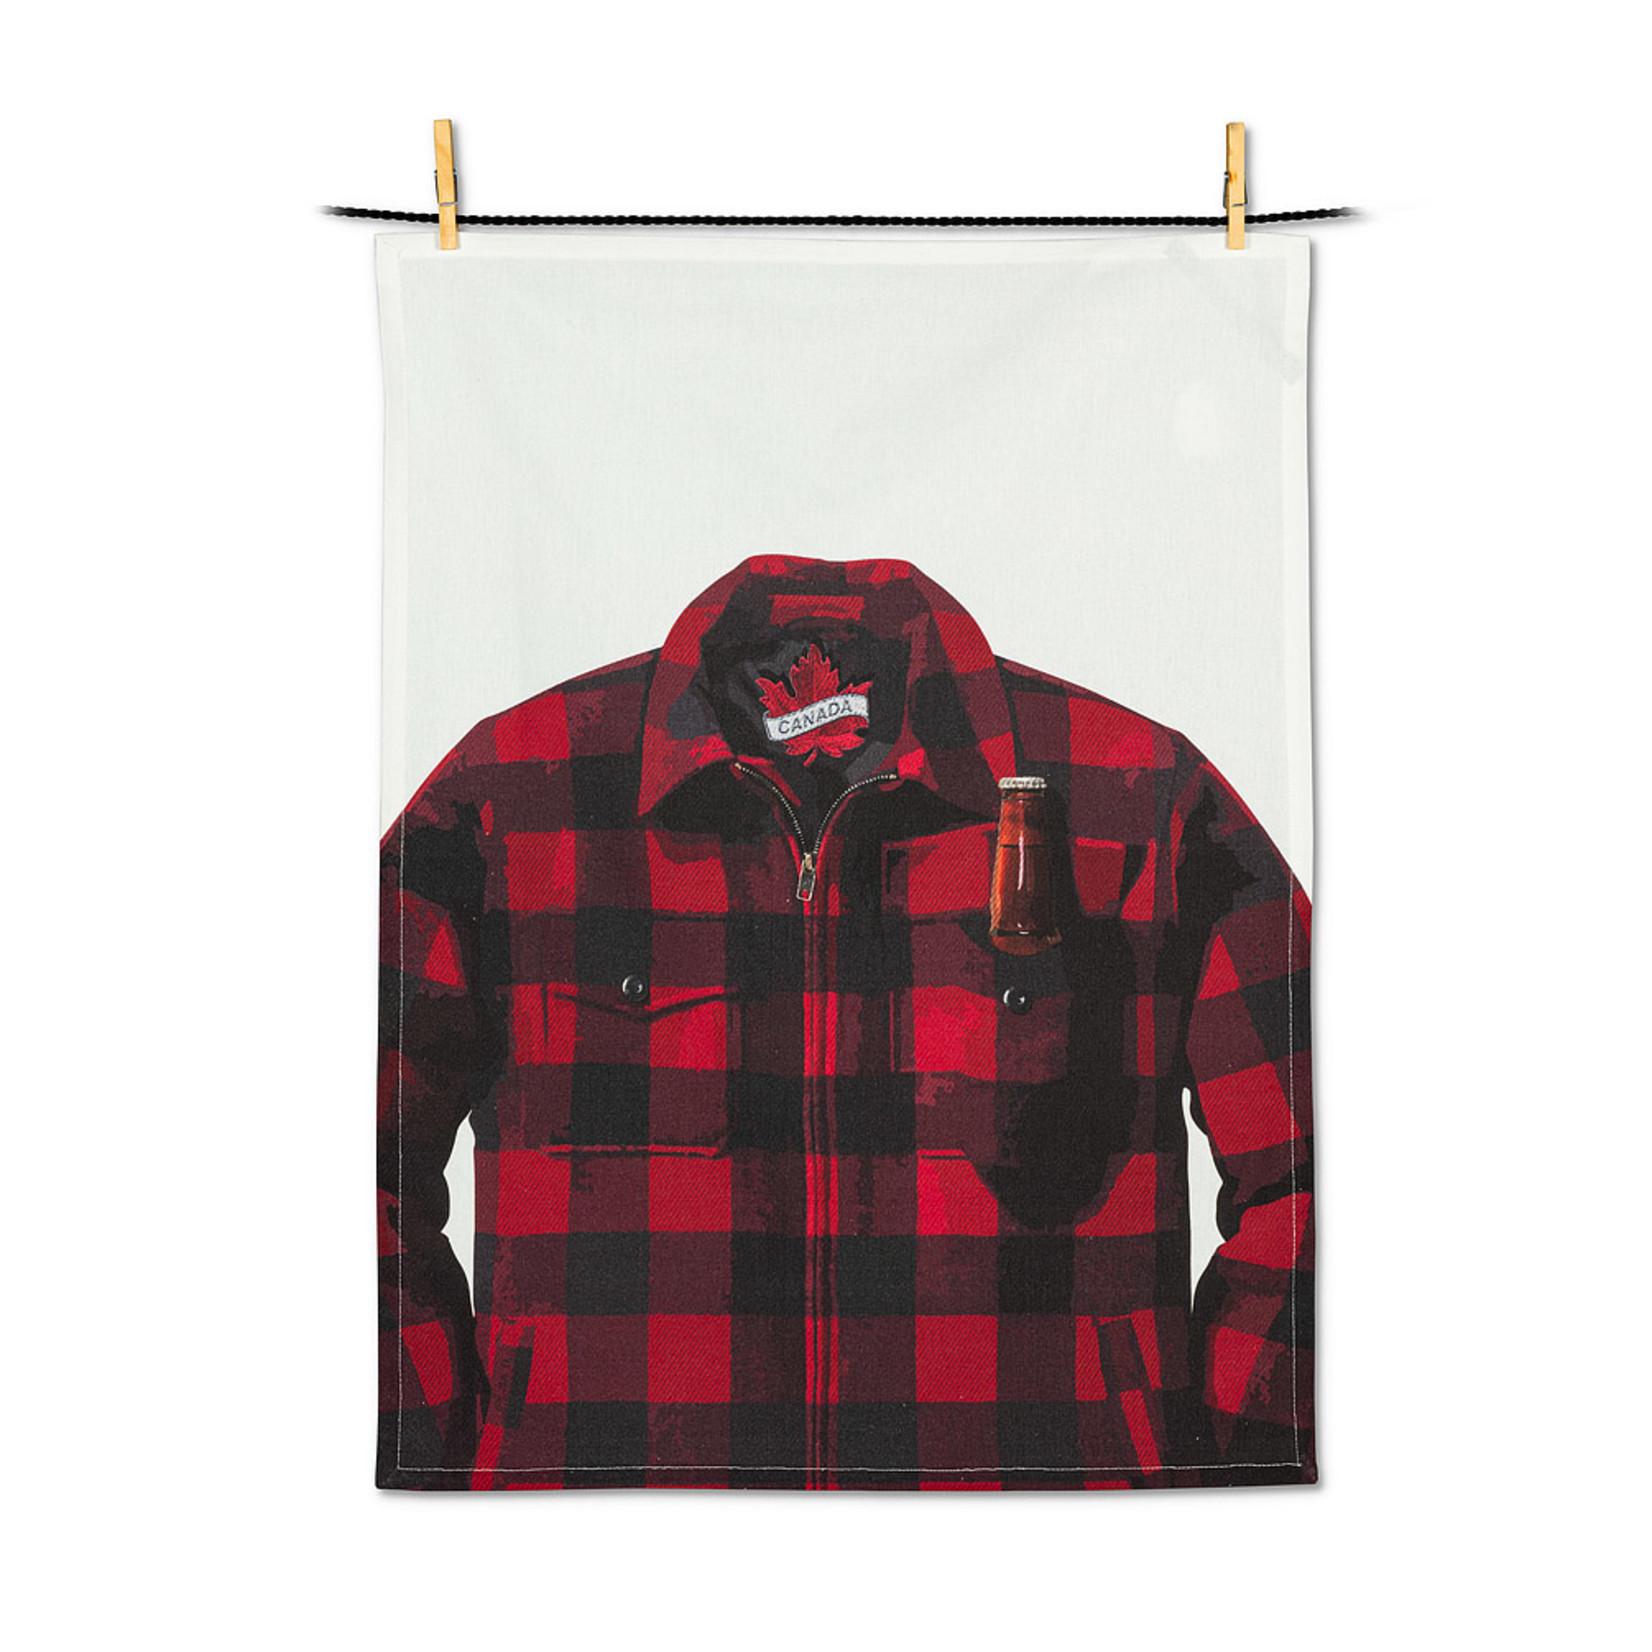 Abbott Buffalo Check Jacket with Beer Tea Towel